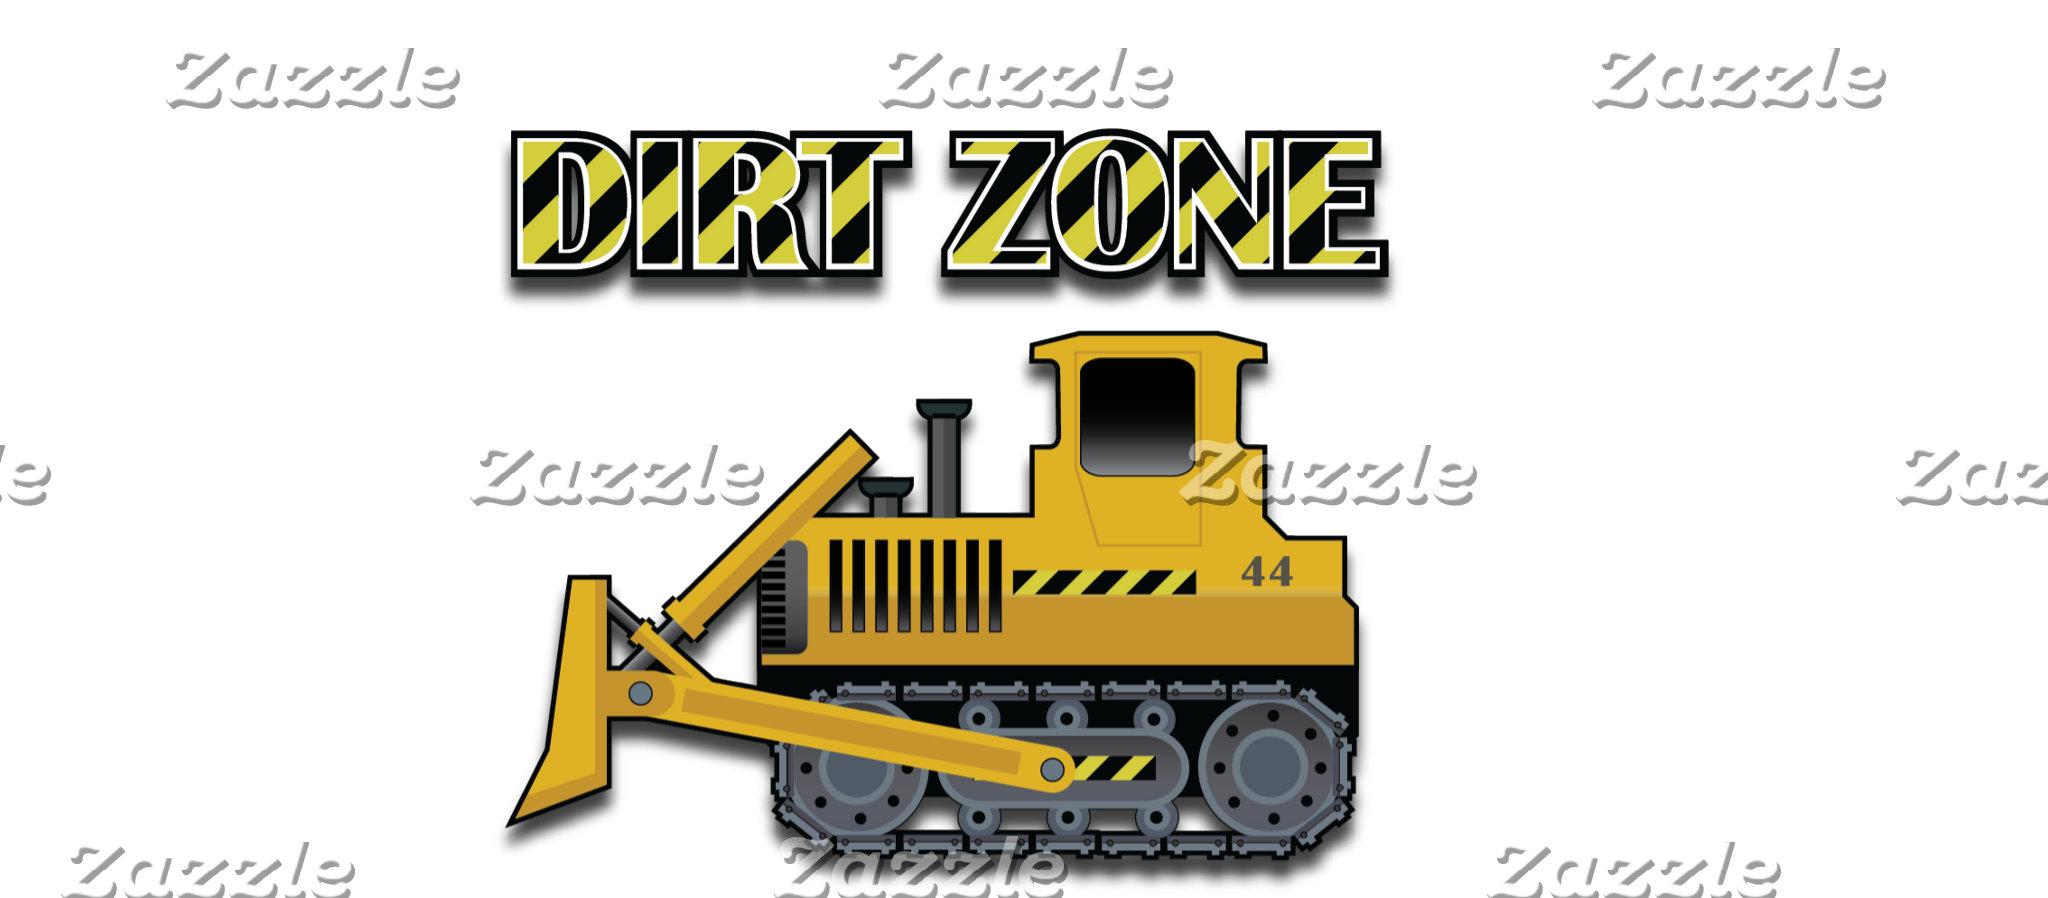 Dirt Zone (Bulldozer)